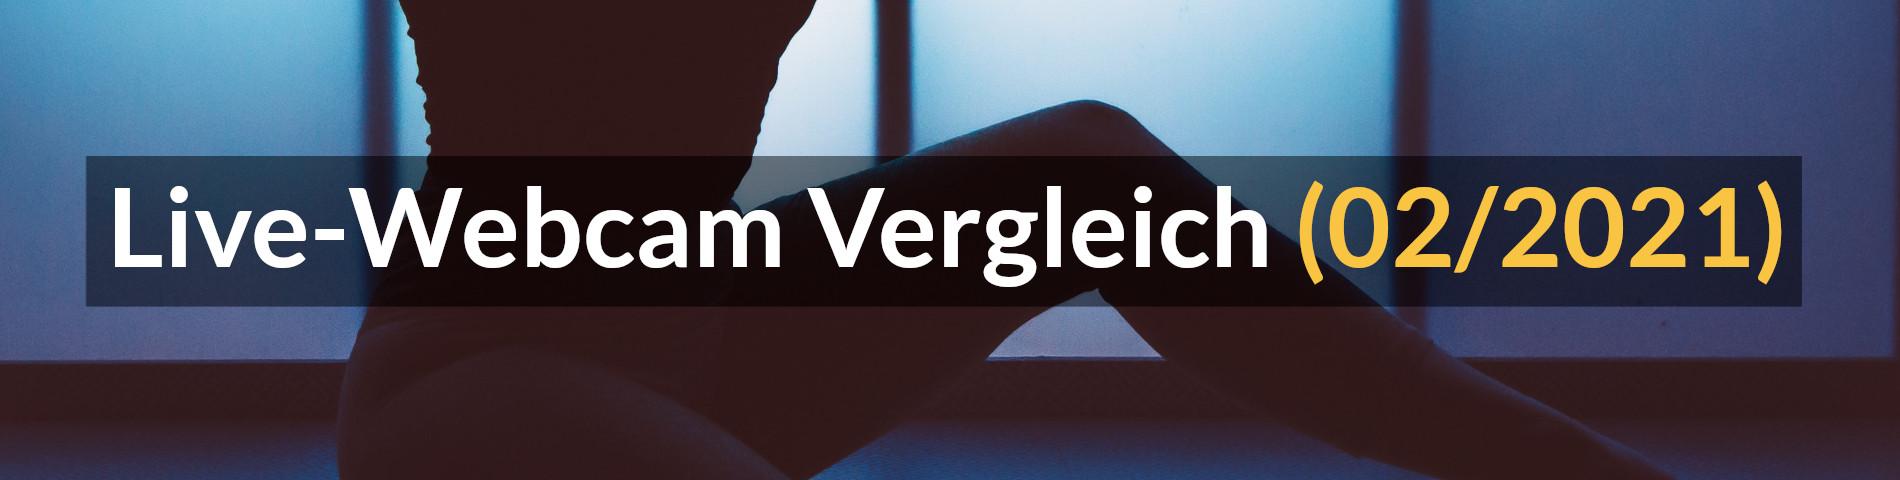 Live Webcam Vergleich Header